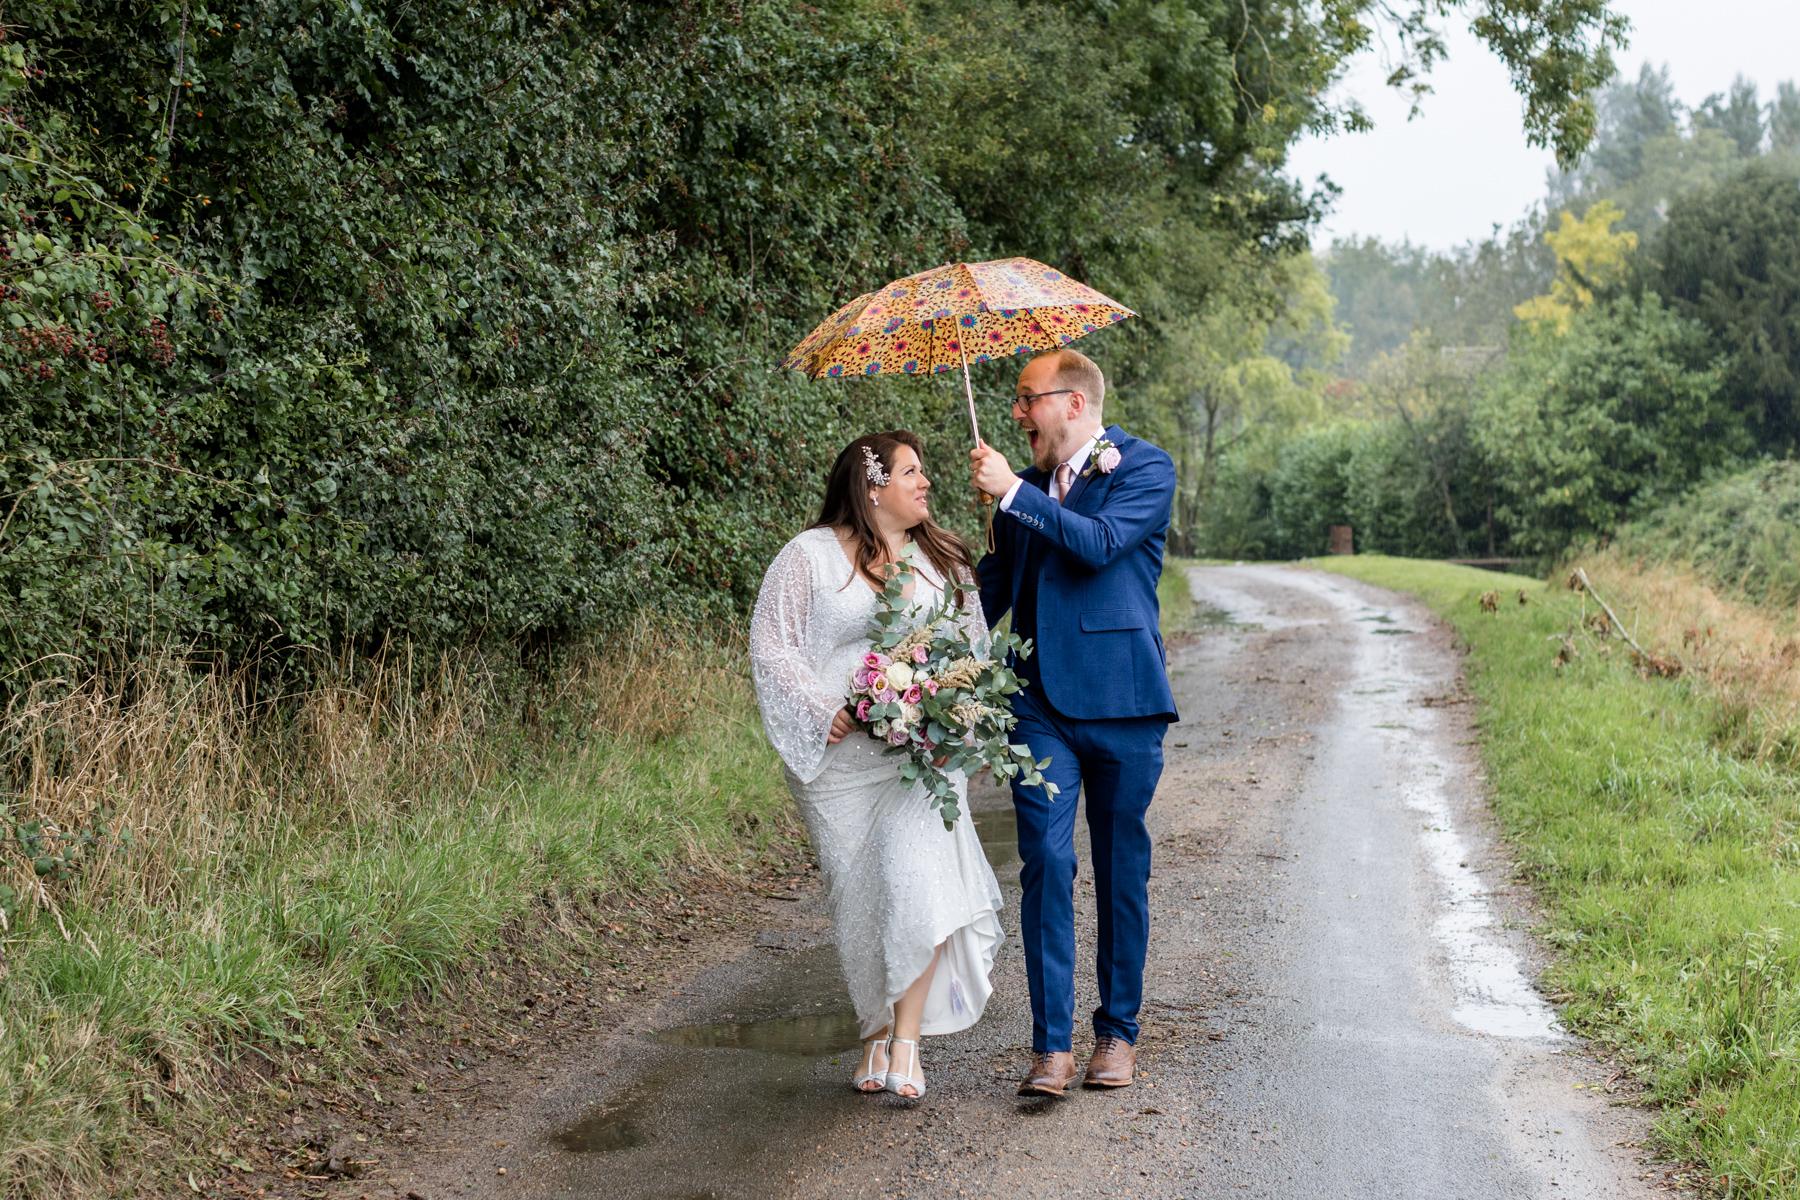 Nriade and groom walking in the rain